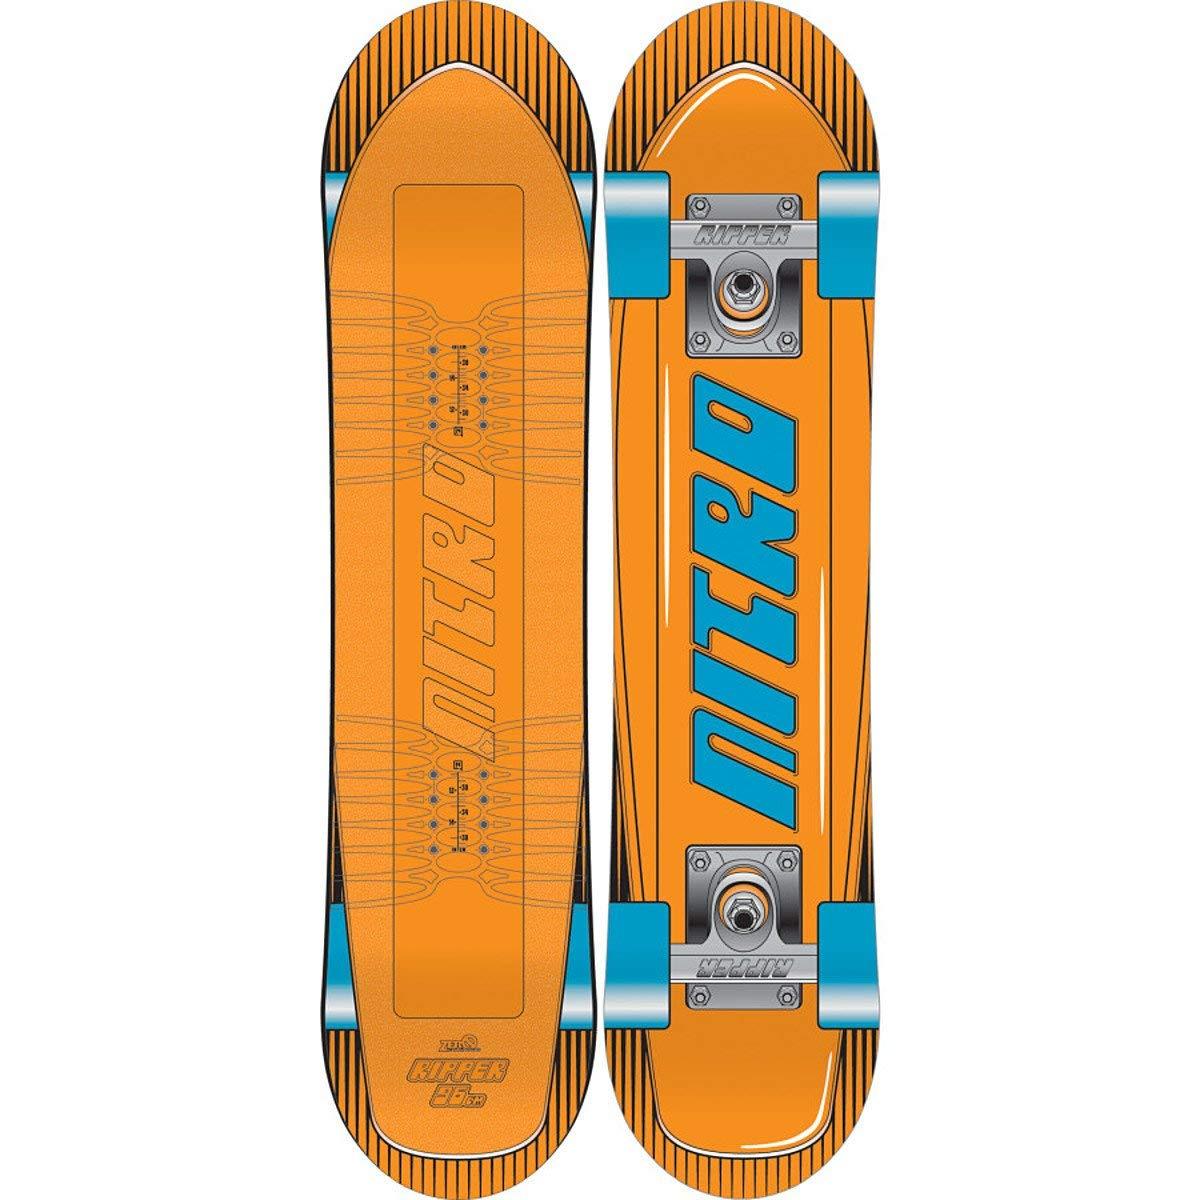 b3d0dc054e31 Buy Nitro Ripper Wide Snowboard 146 Youth Sz 146cm (W) in Cheap ...